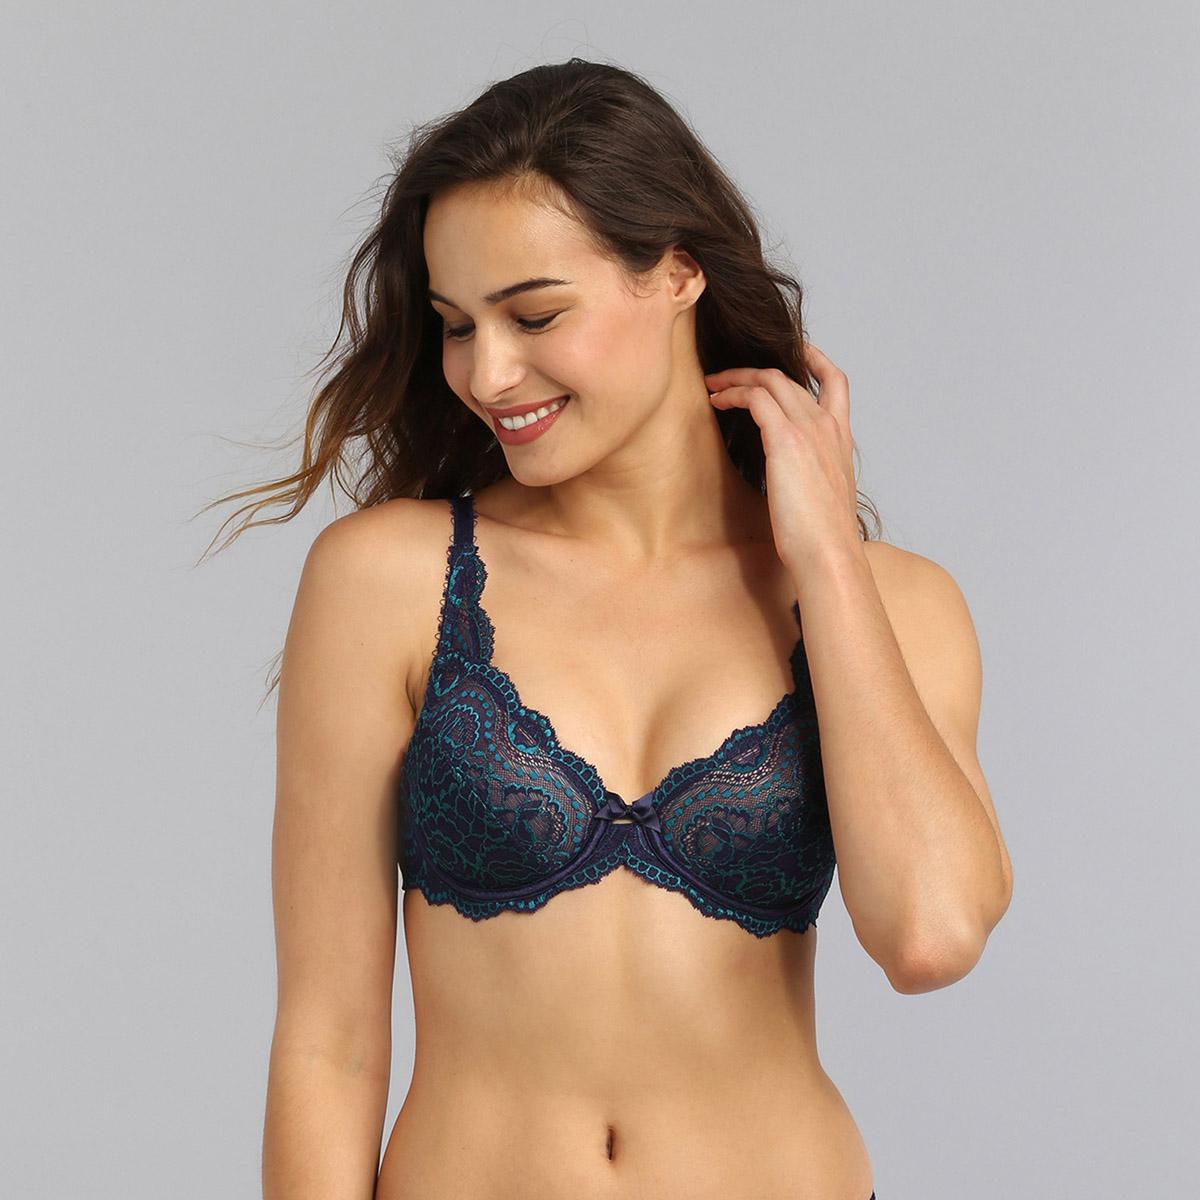 Underwired bra in navy Flower Elegance, , PLAYTEX